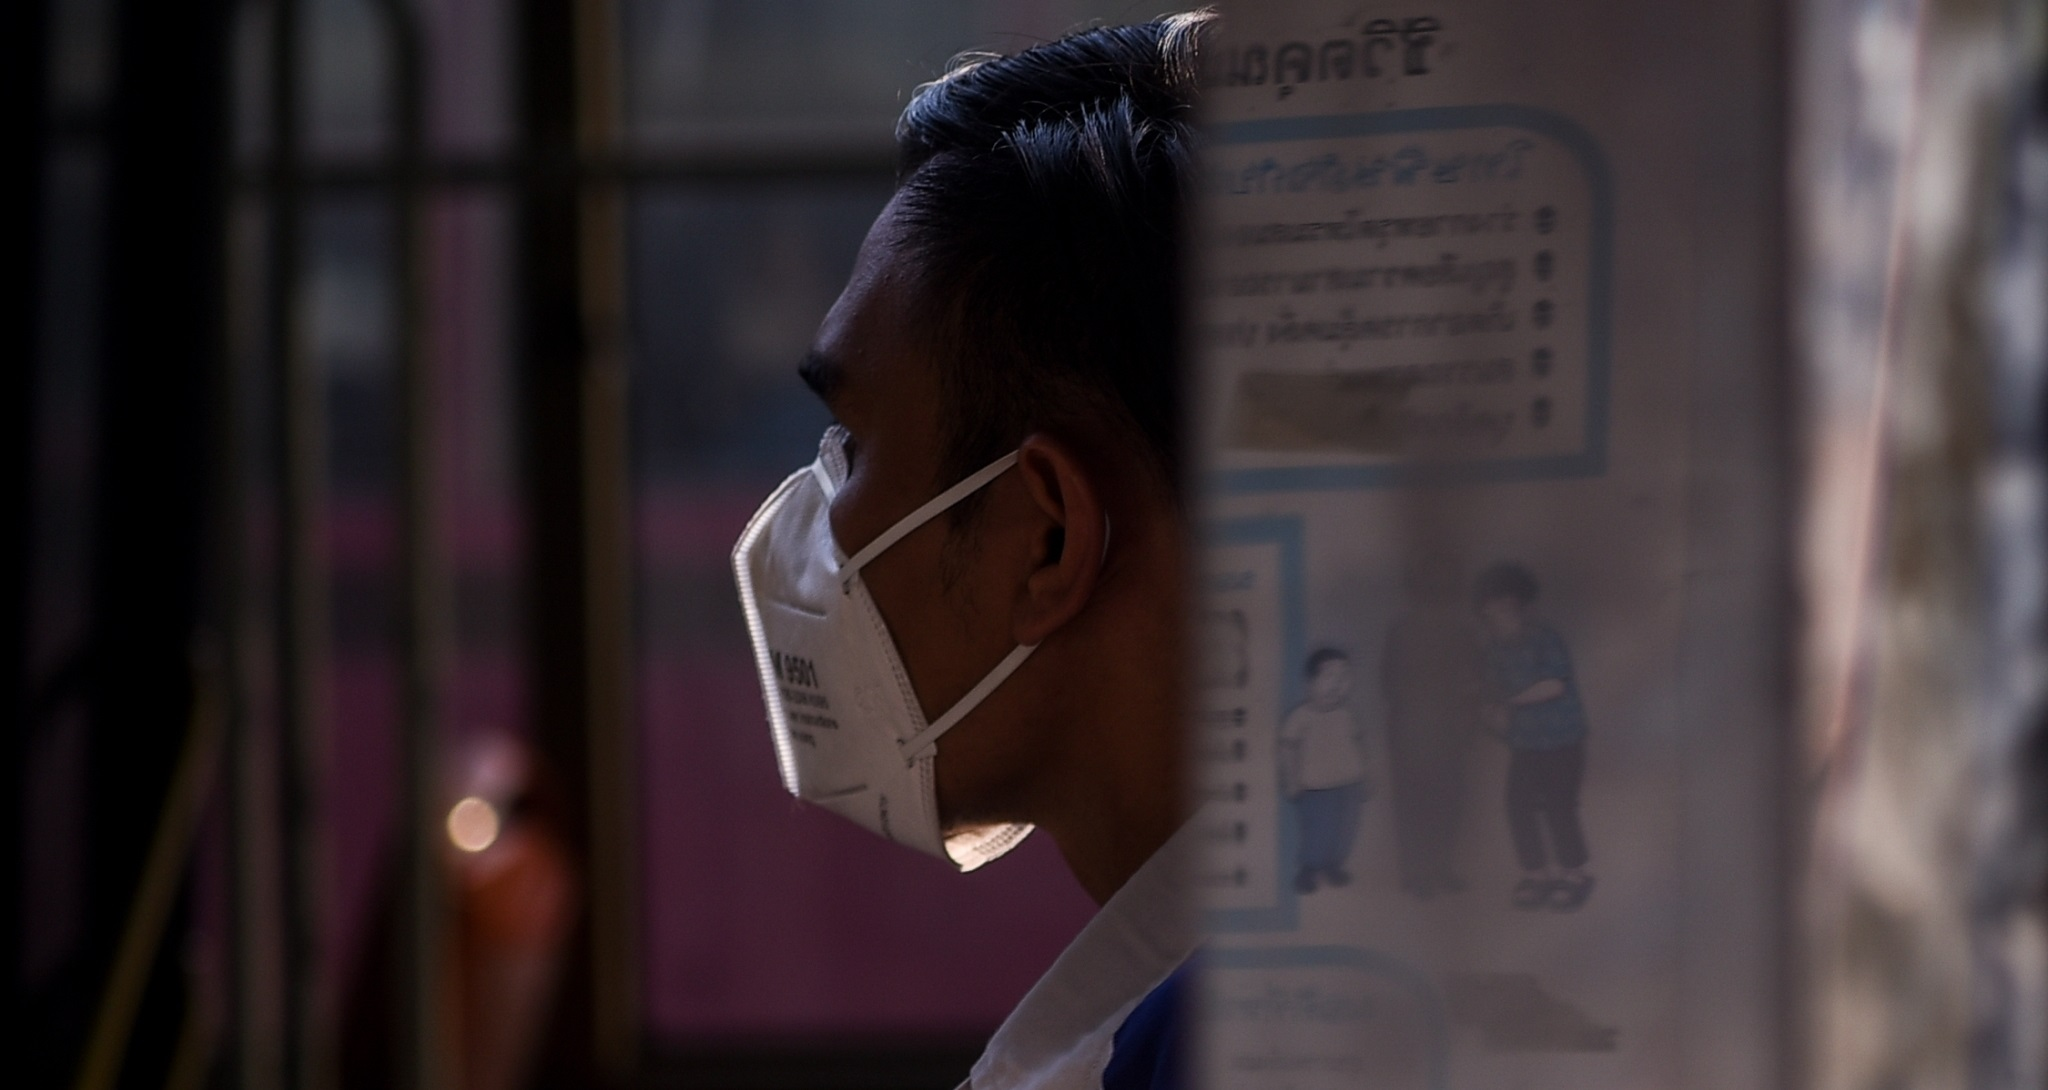 PM 2.5 ค่าฝุ่น ค่าฝุ่นสูงเกินมาตรฐาน ฝุ่น PM 2.5 ฝุ่นละออง